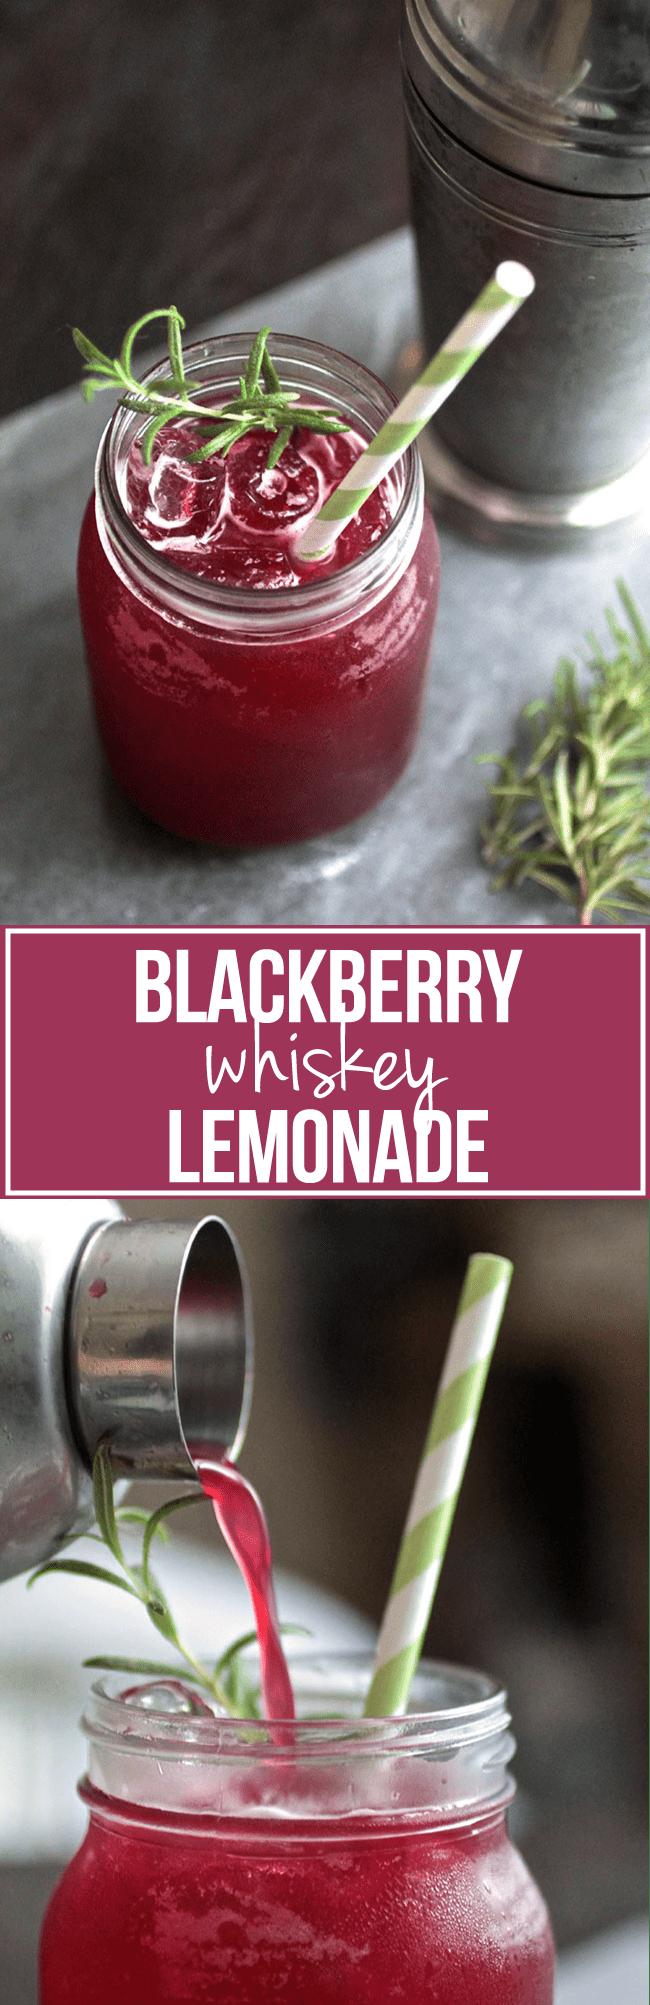 Photo of Blackberry Whiskey Lemonade – Life As A Strawberry